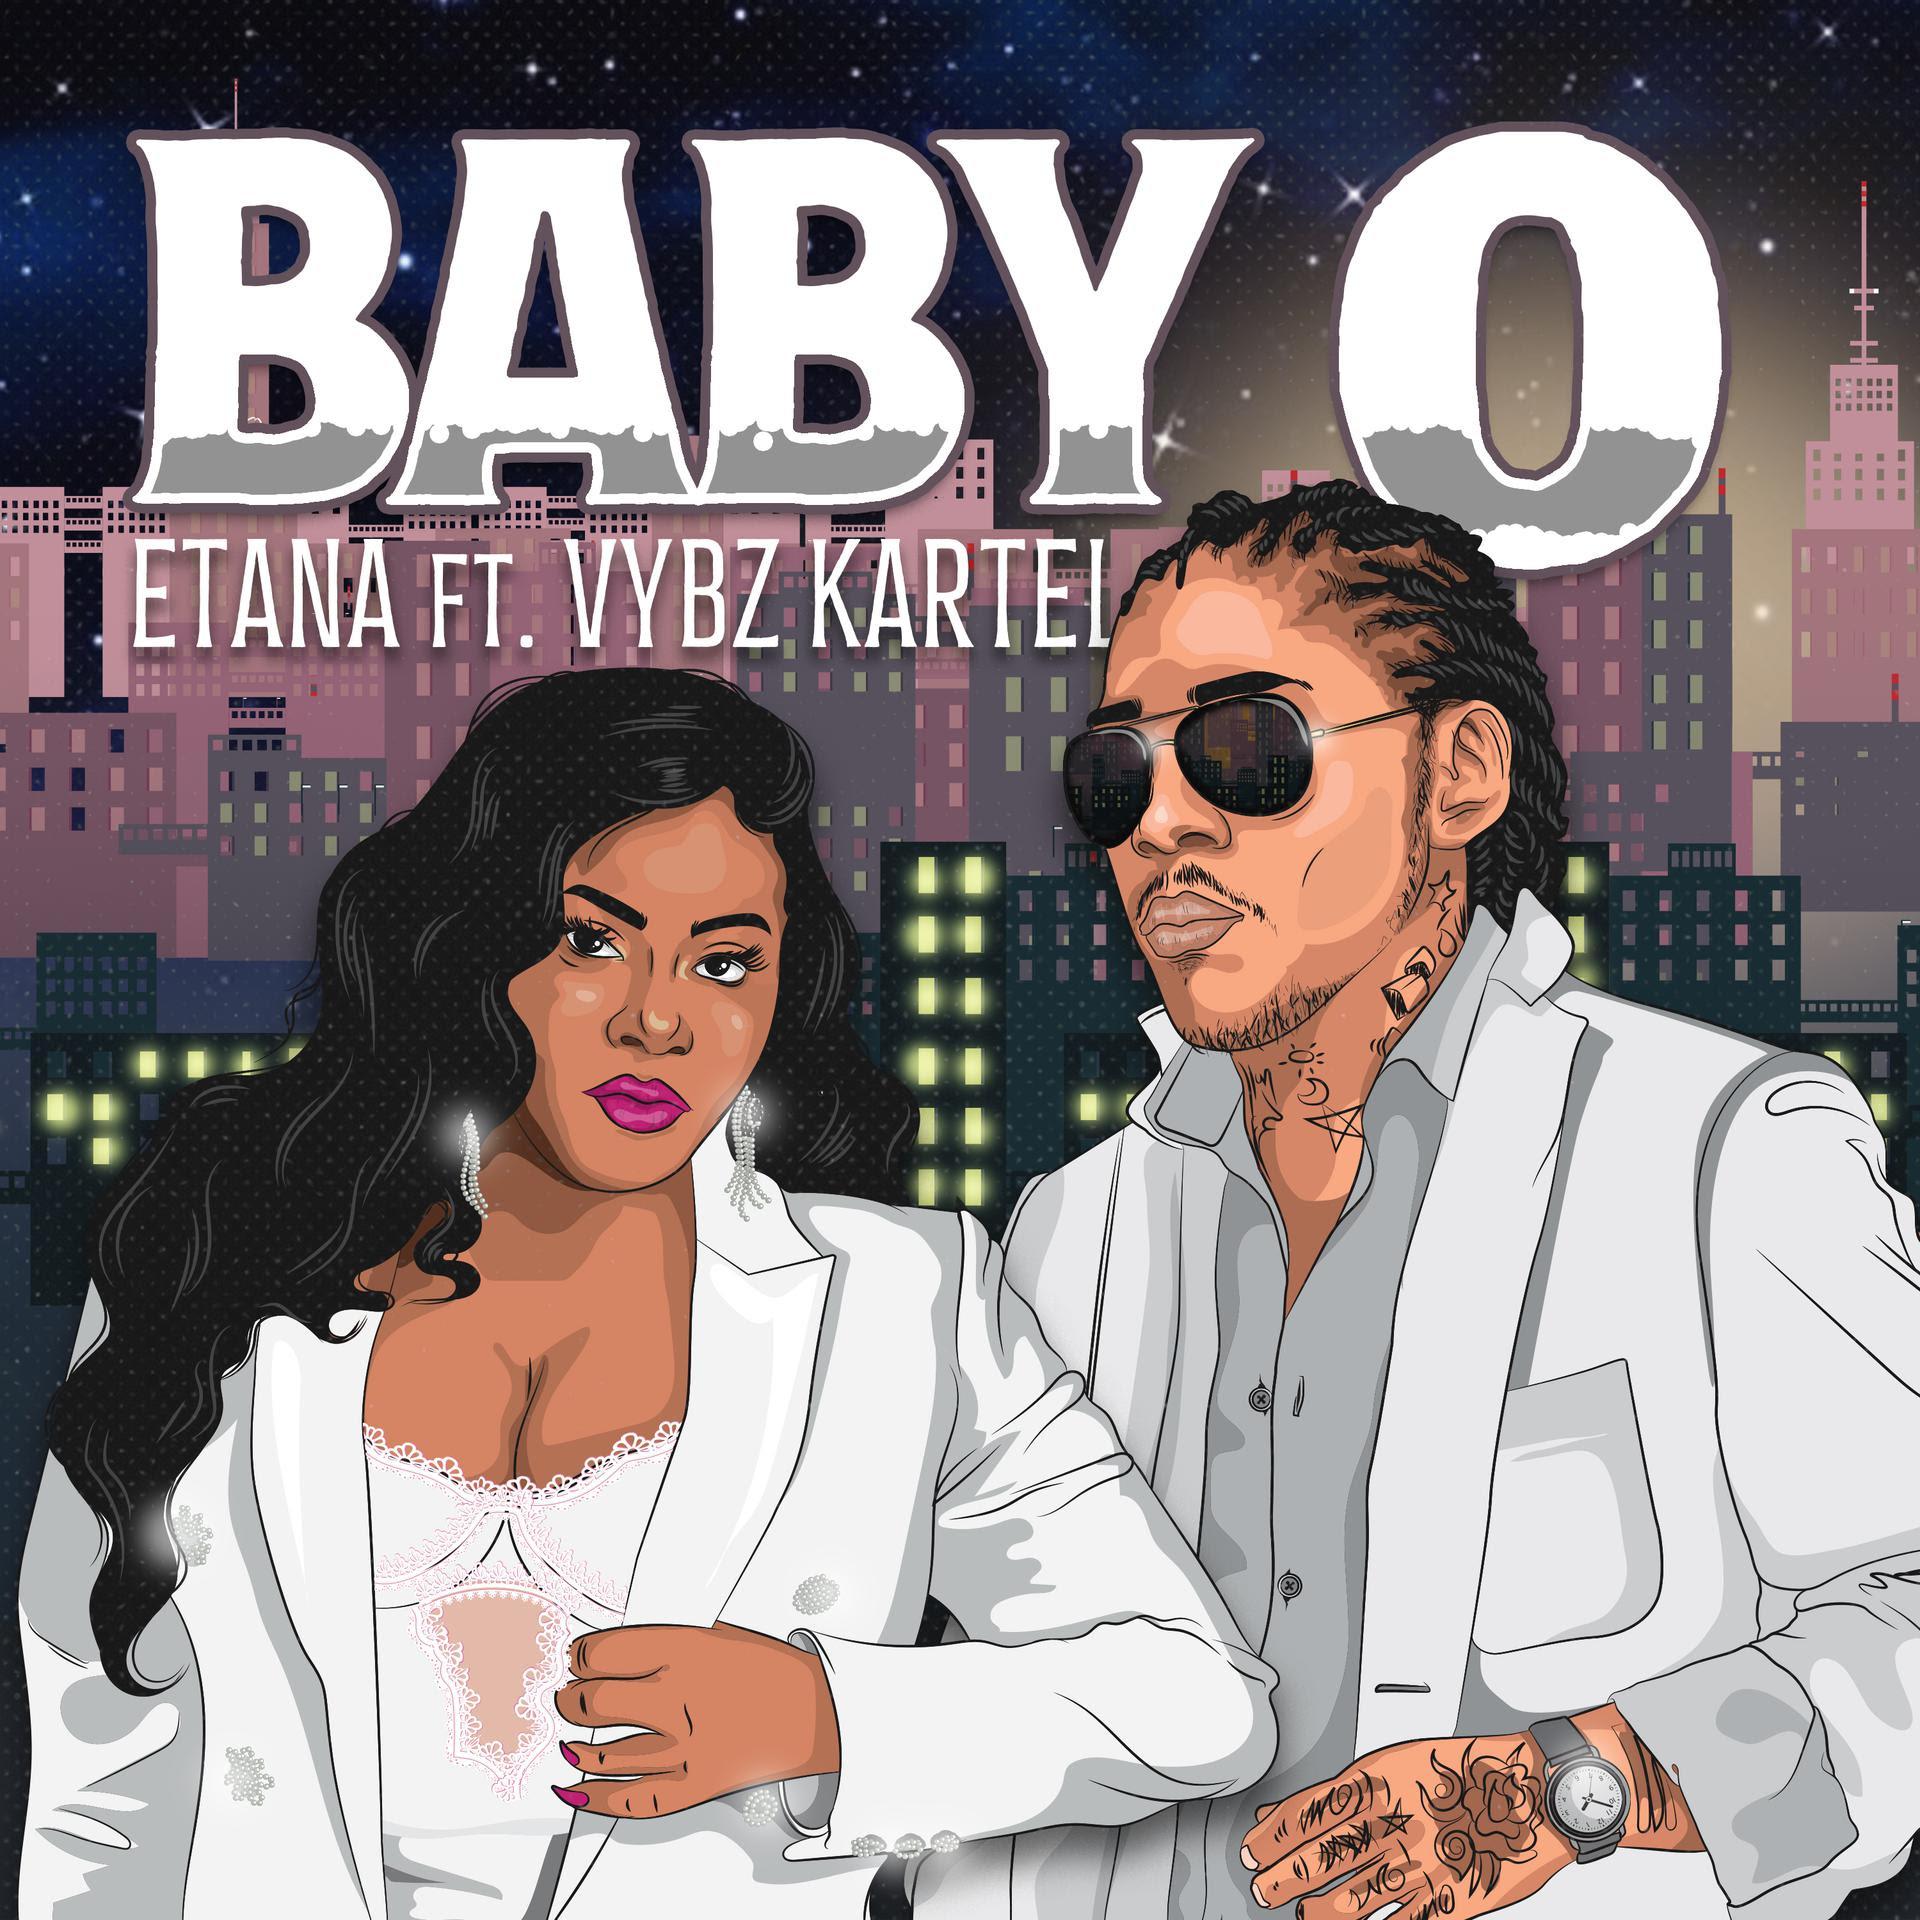 Etana Ft. Vybz Kartel – Baby O